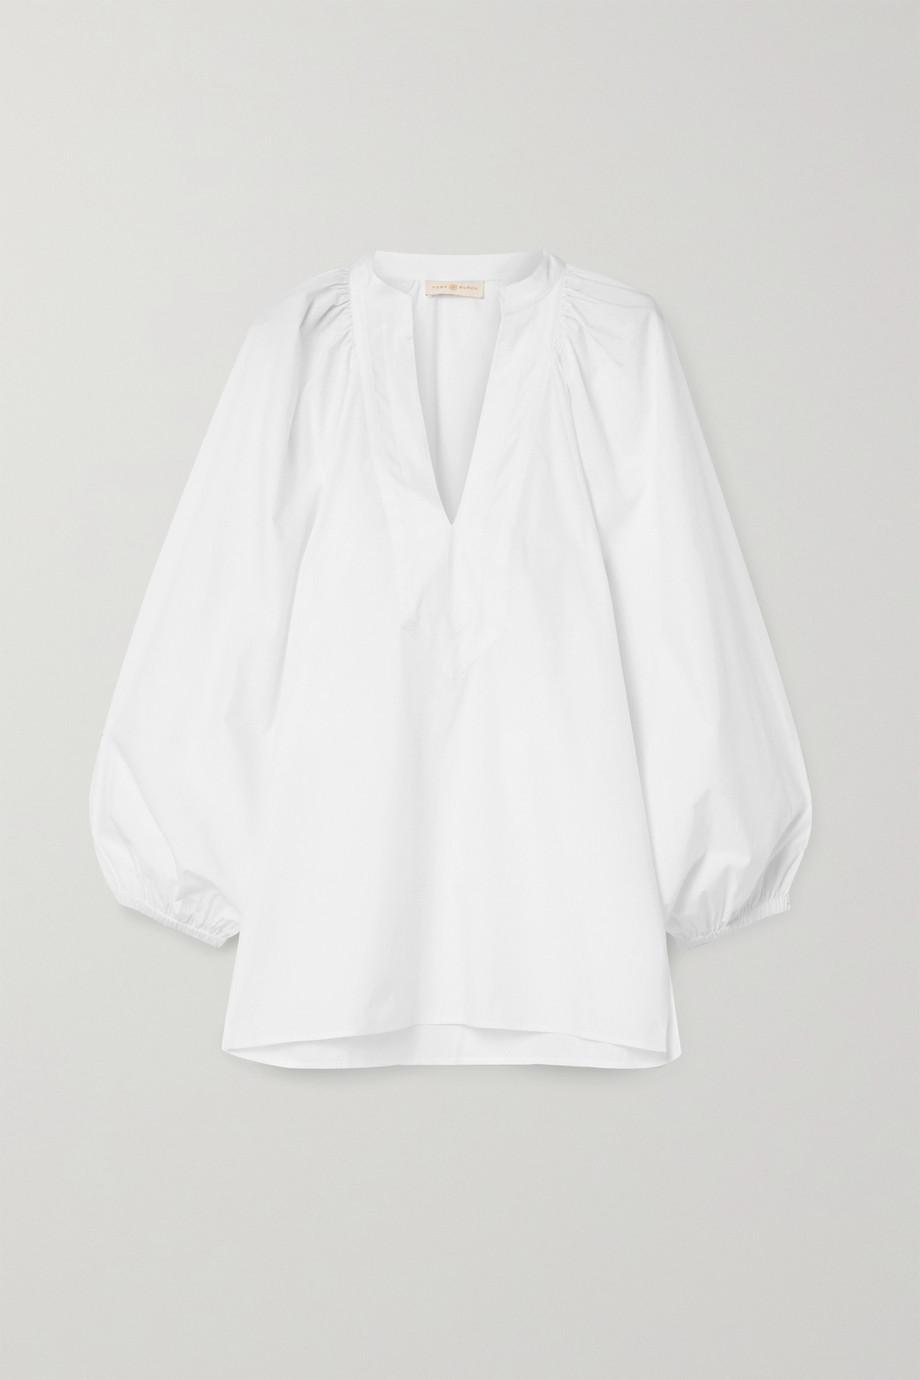 Tory Burch Grosgrain-trimmed cotton-poplin blouse